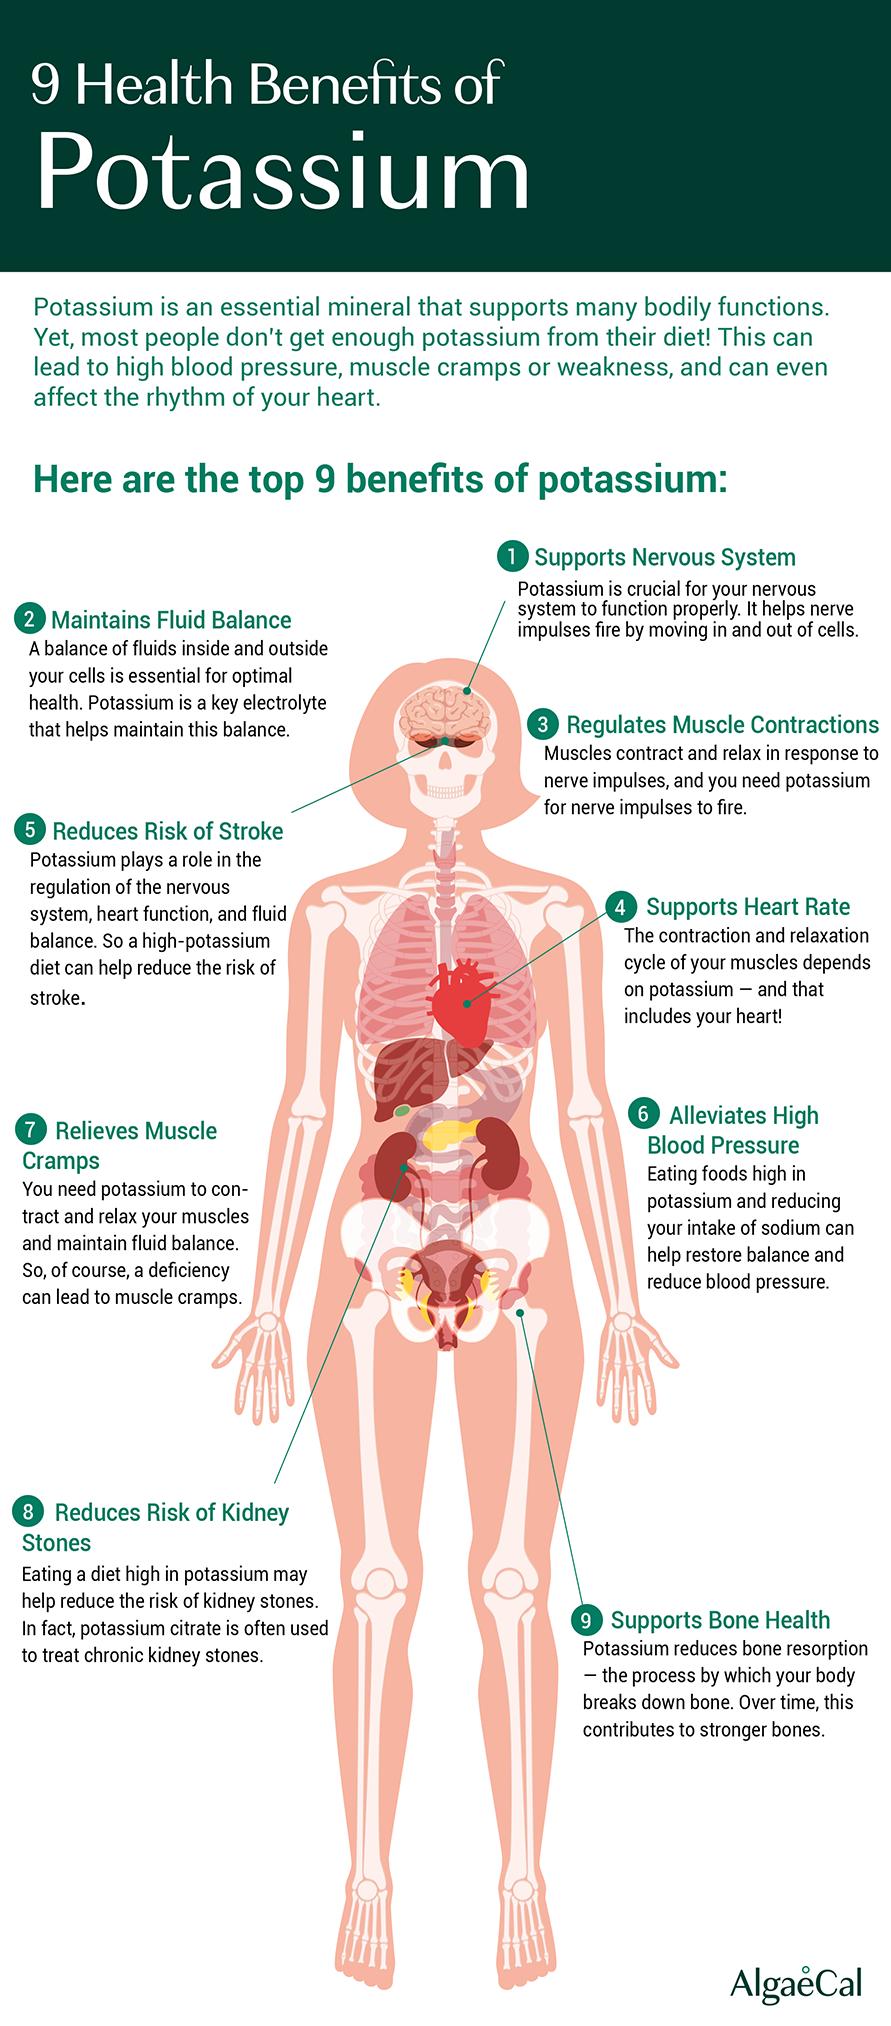 9 Health Benefits of Potassium